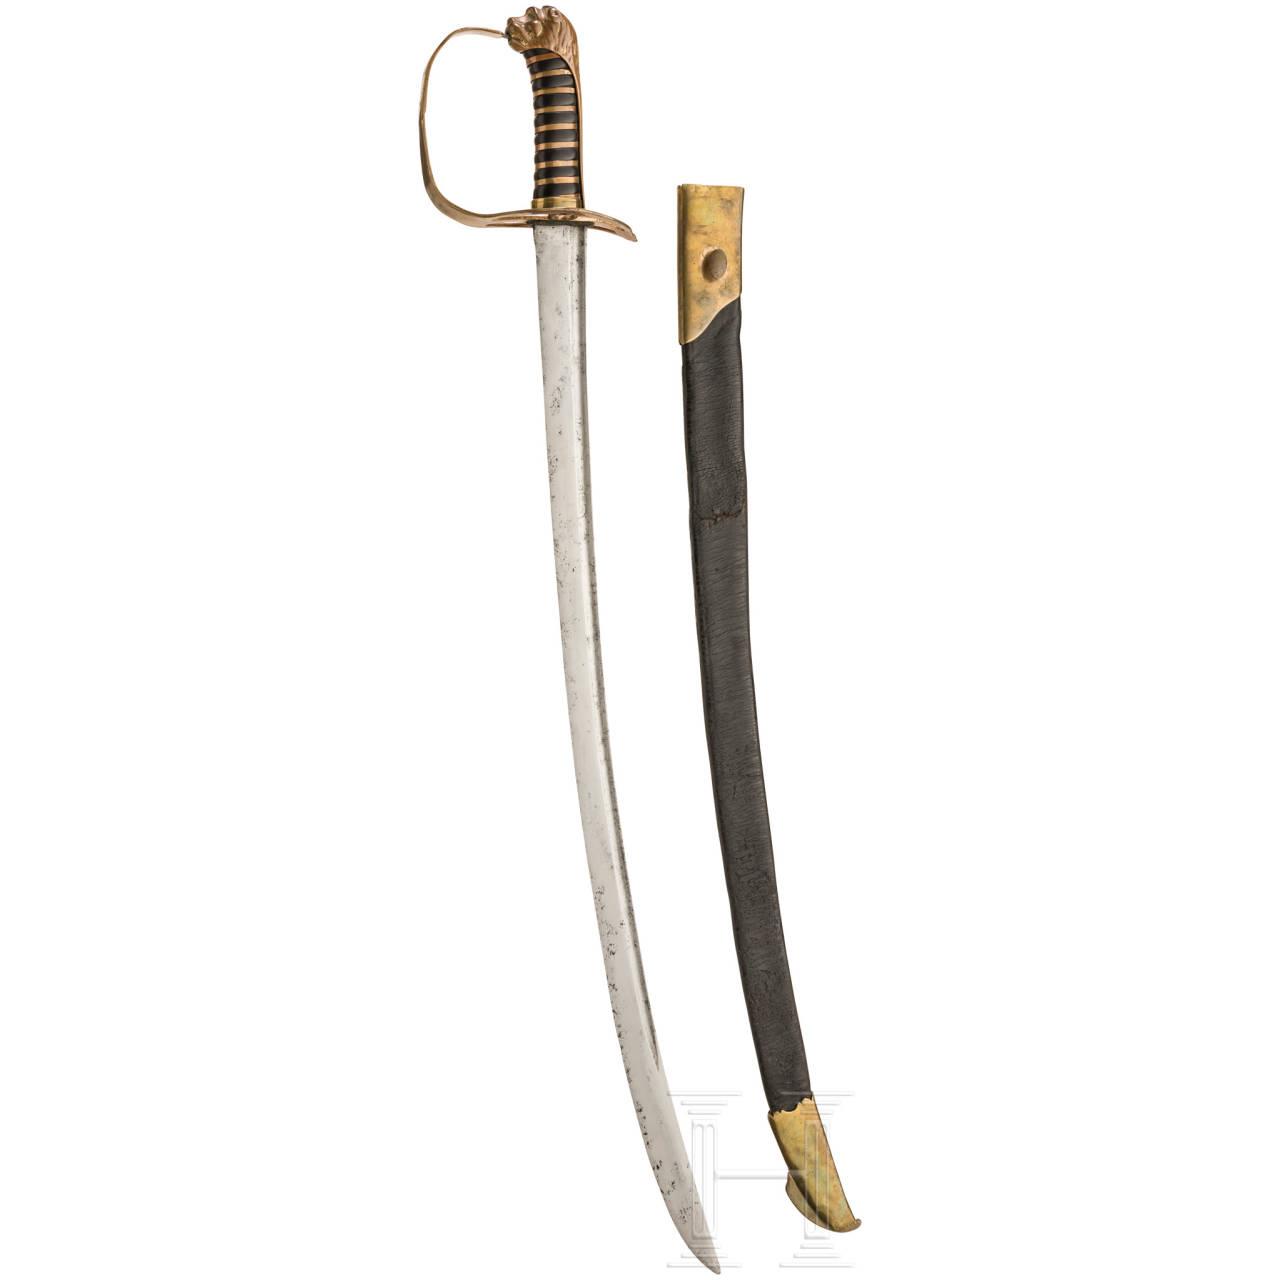 Sabre for infantry officers, ca. 1790